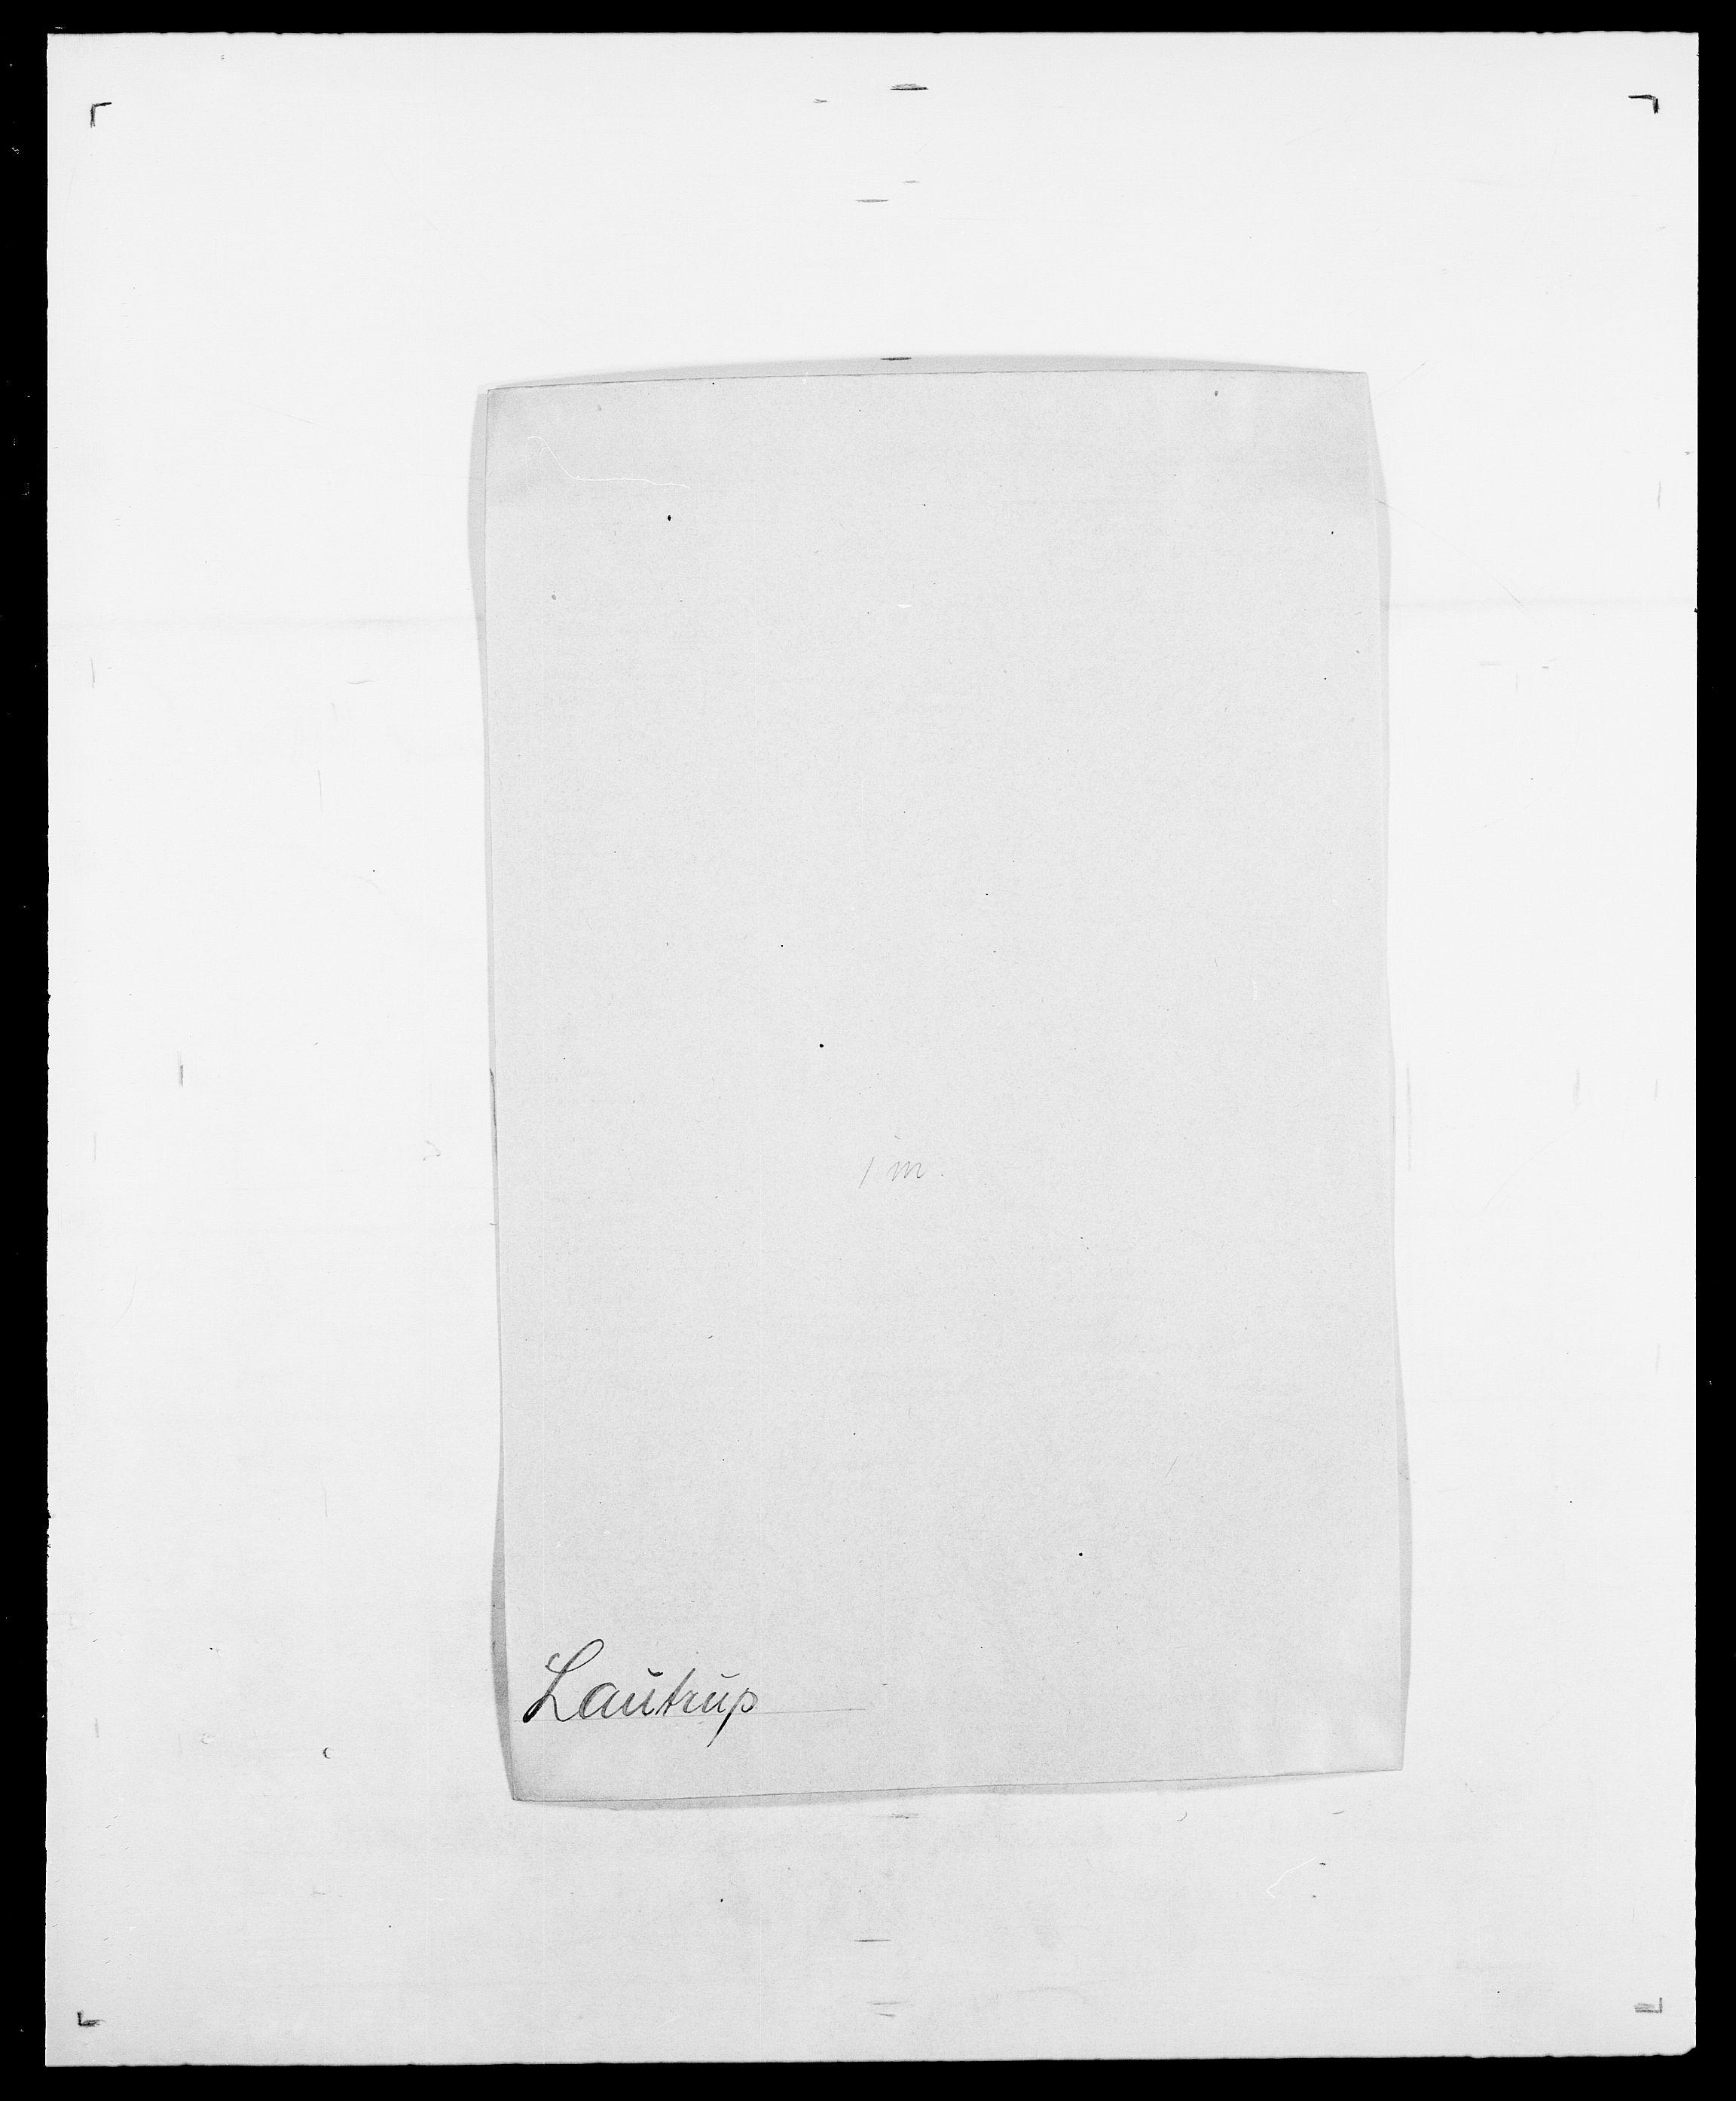 SAO, Delgobe, Charles Antoine - samling, D/Da/L0023: Lau - Lirvyn, s. 27